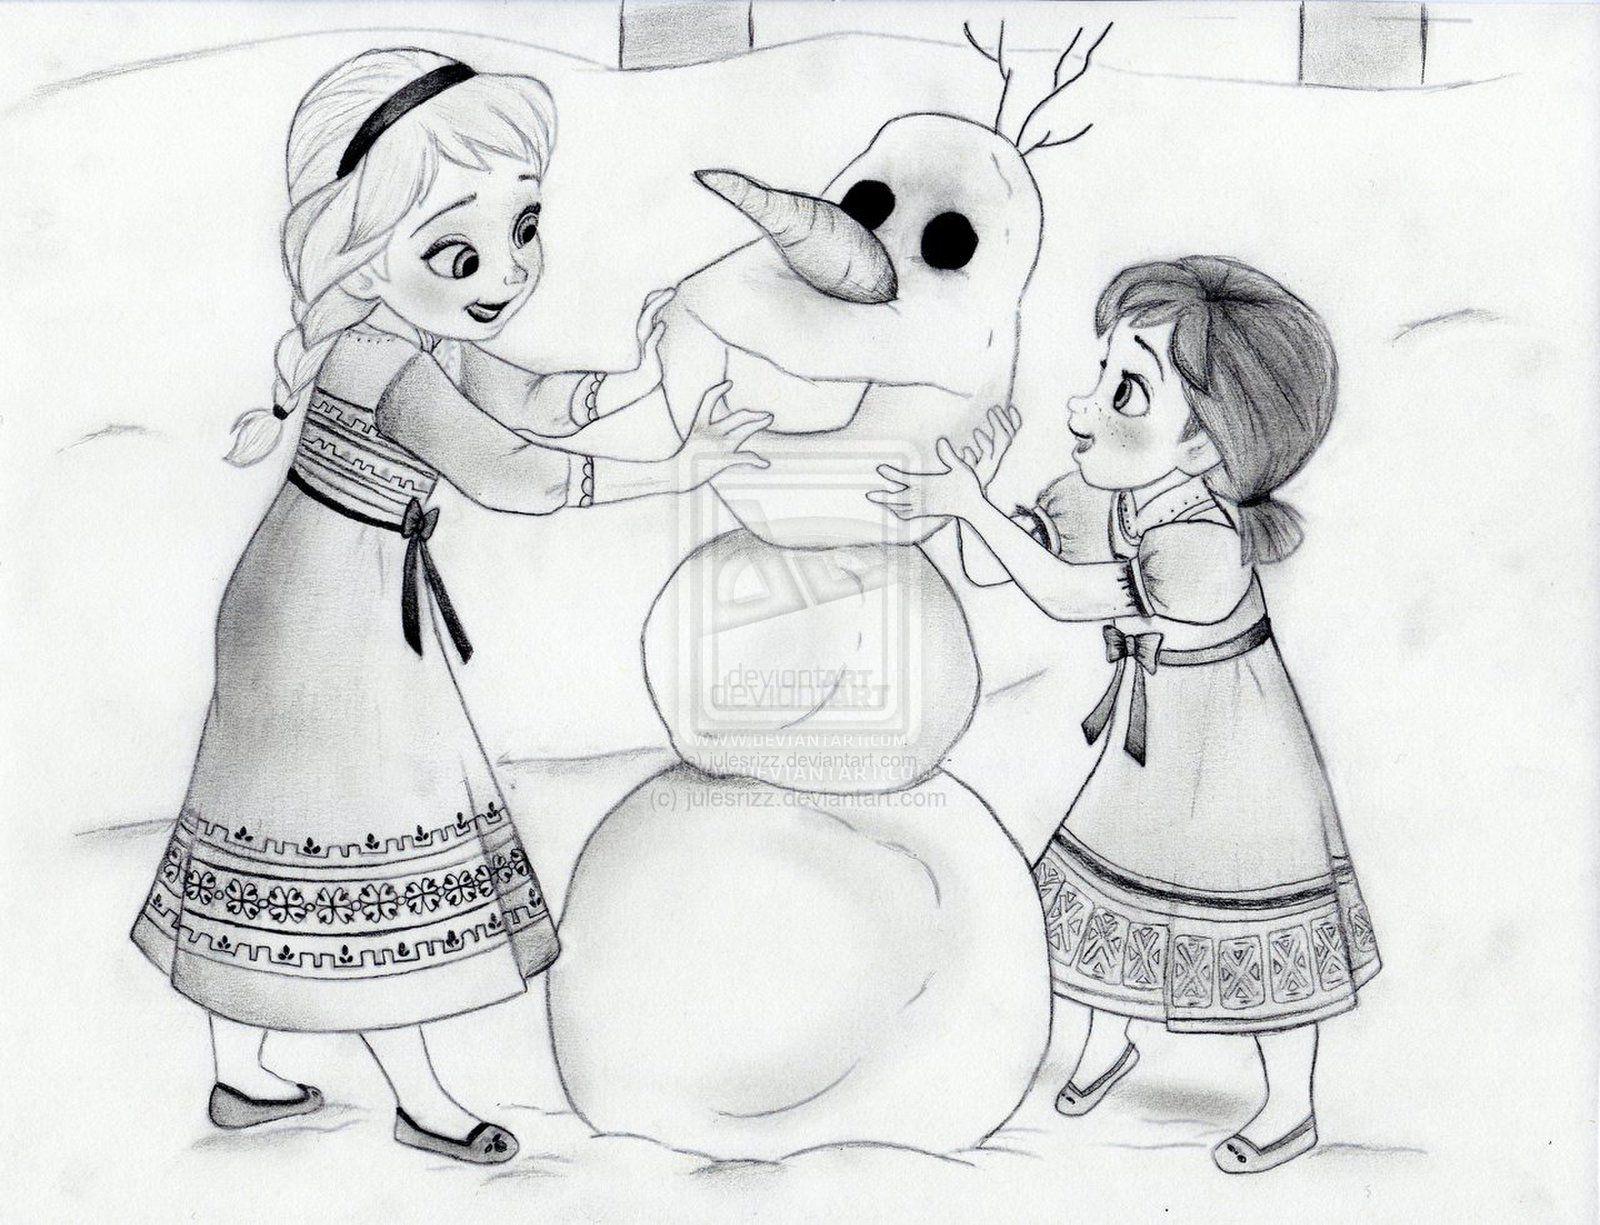 Https S Media Cache Ak0 Pinimg Com Originals 31 6f 16 316f1612b719863e690591c26a1ed565 Jpg Princess Drawings Elsa Drawing Frozen Drawings